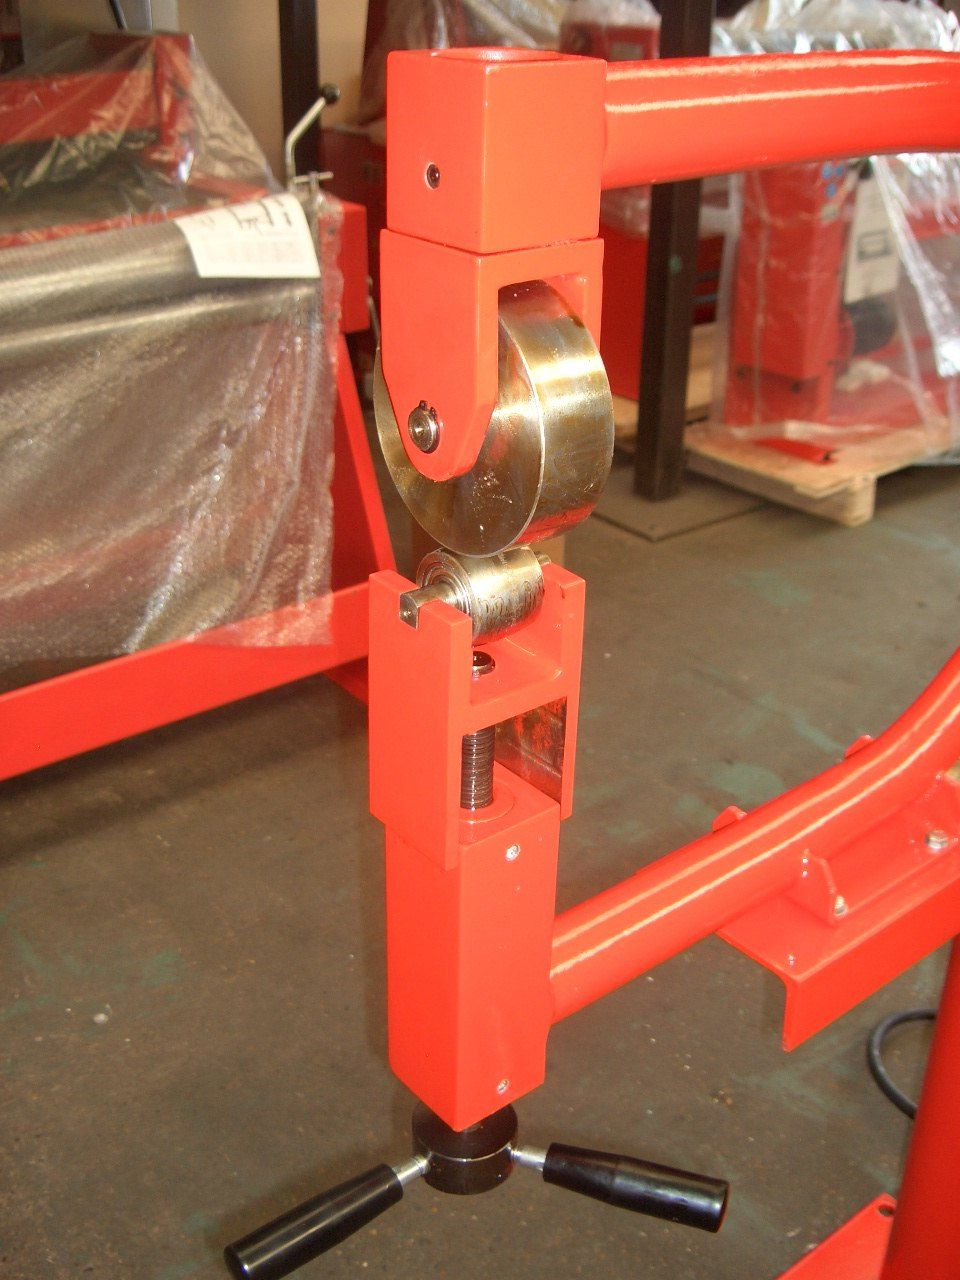 Dmc 34 Wheeling Machine English Wheel Metal Shaping English Wheel Metal Shaping Sheet Metal Tools